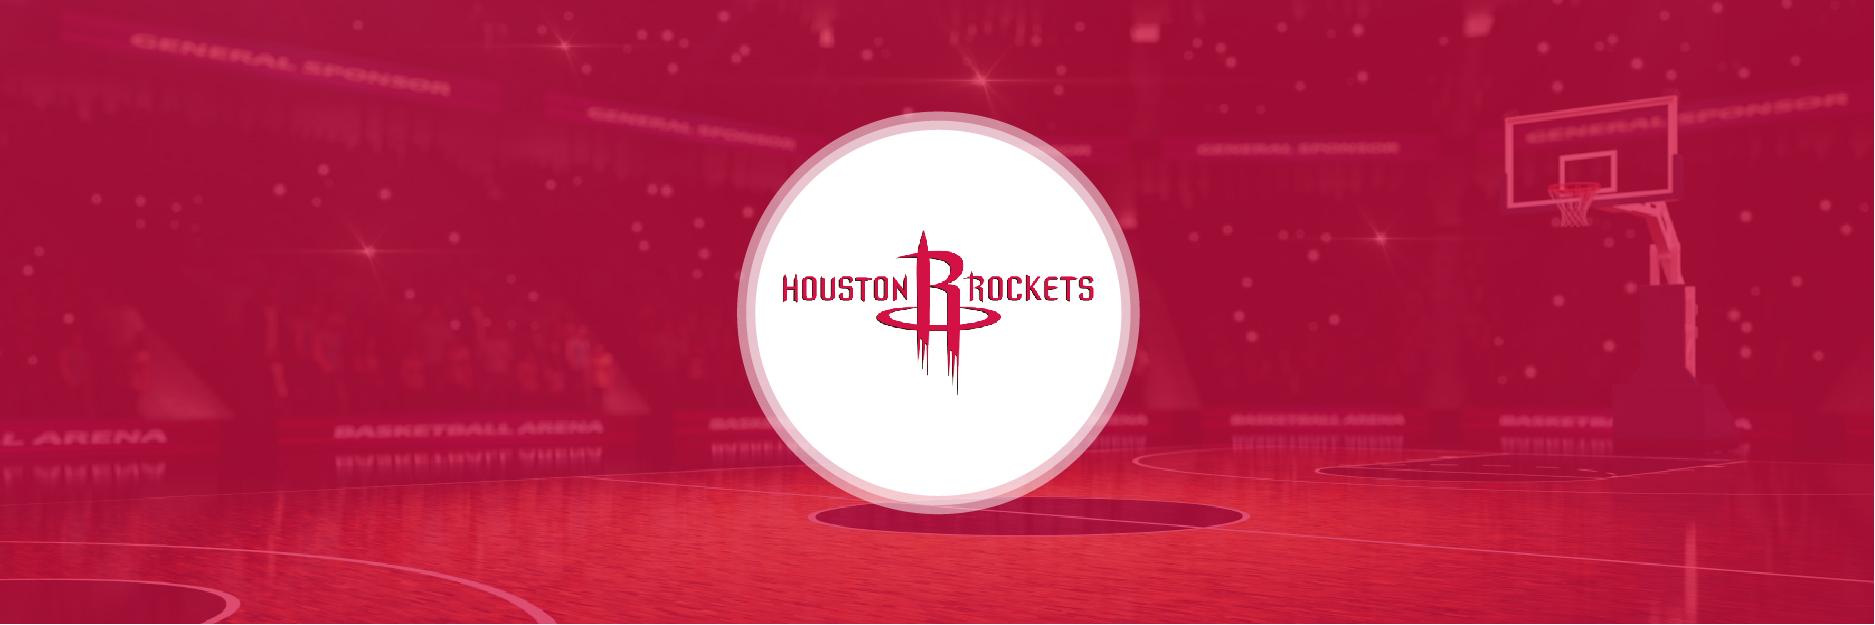 NBA Houston Rockets 2020 Season Analysis